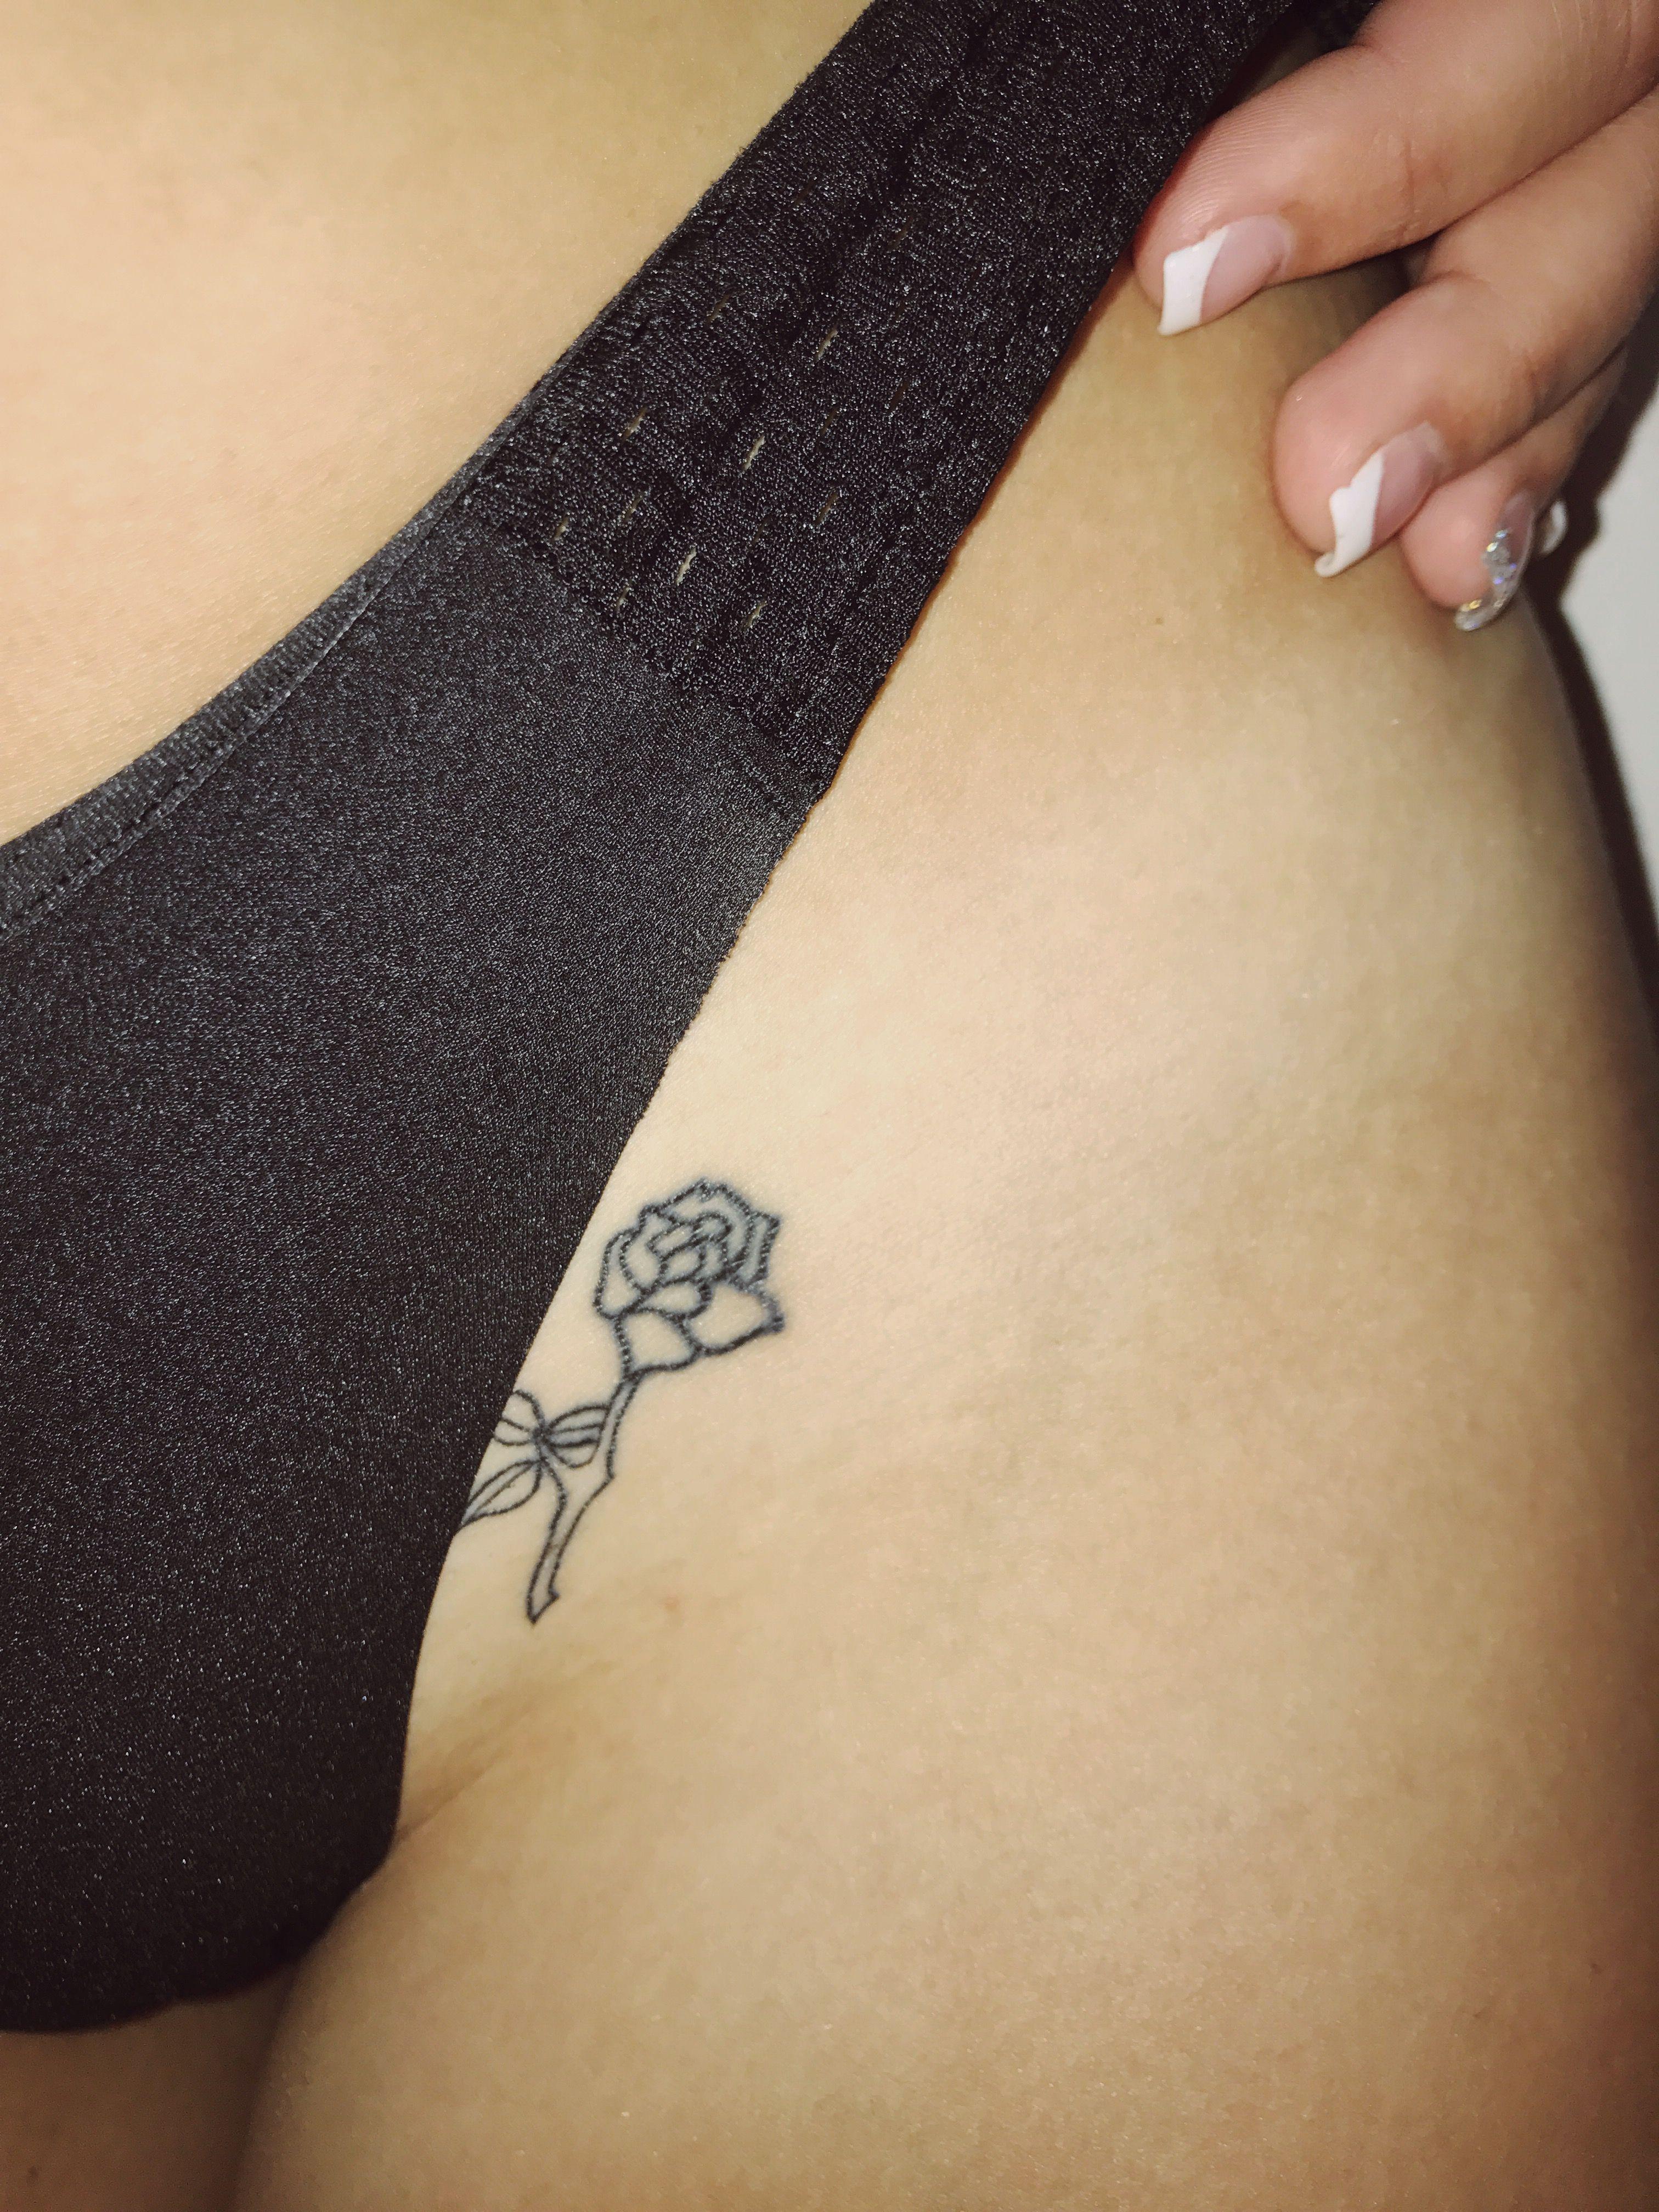 Rose Tattoo In 2020 Hip Thigh Tattoos Hip Tattoo Hip Tattoo Designs